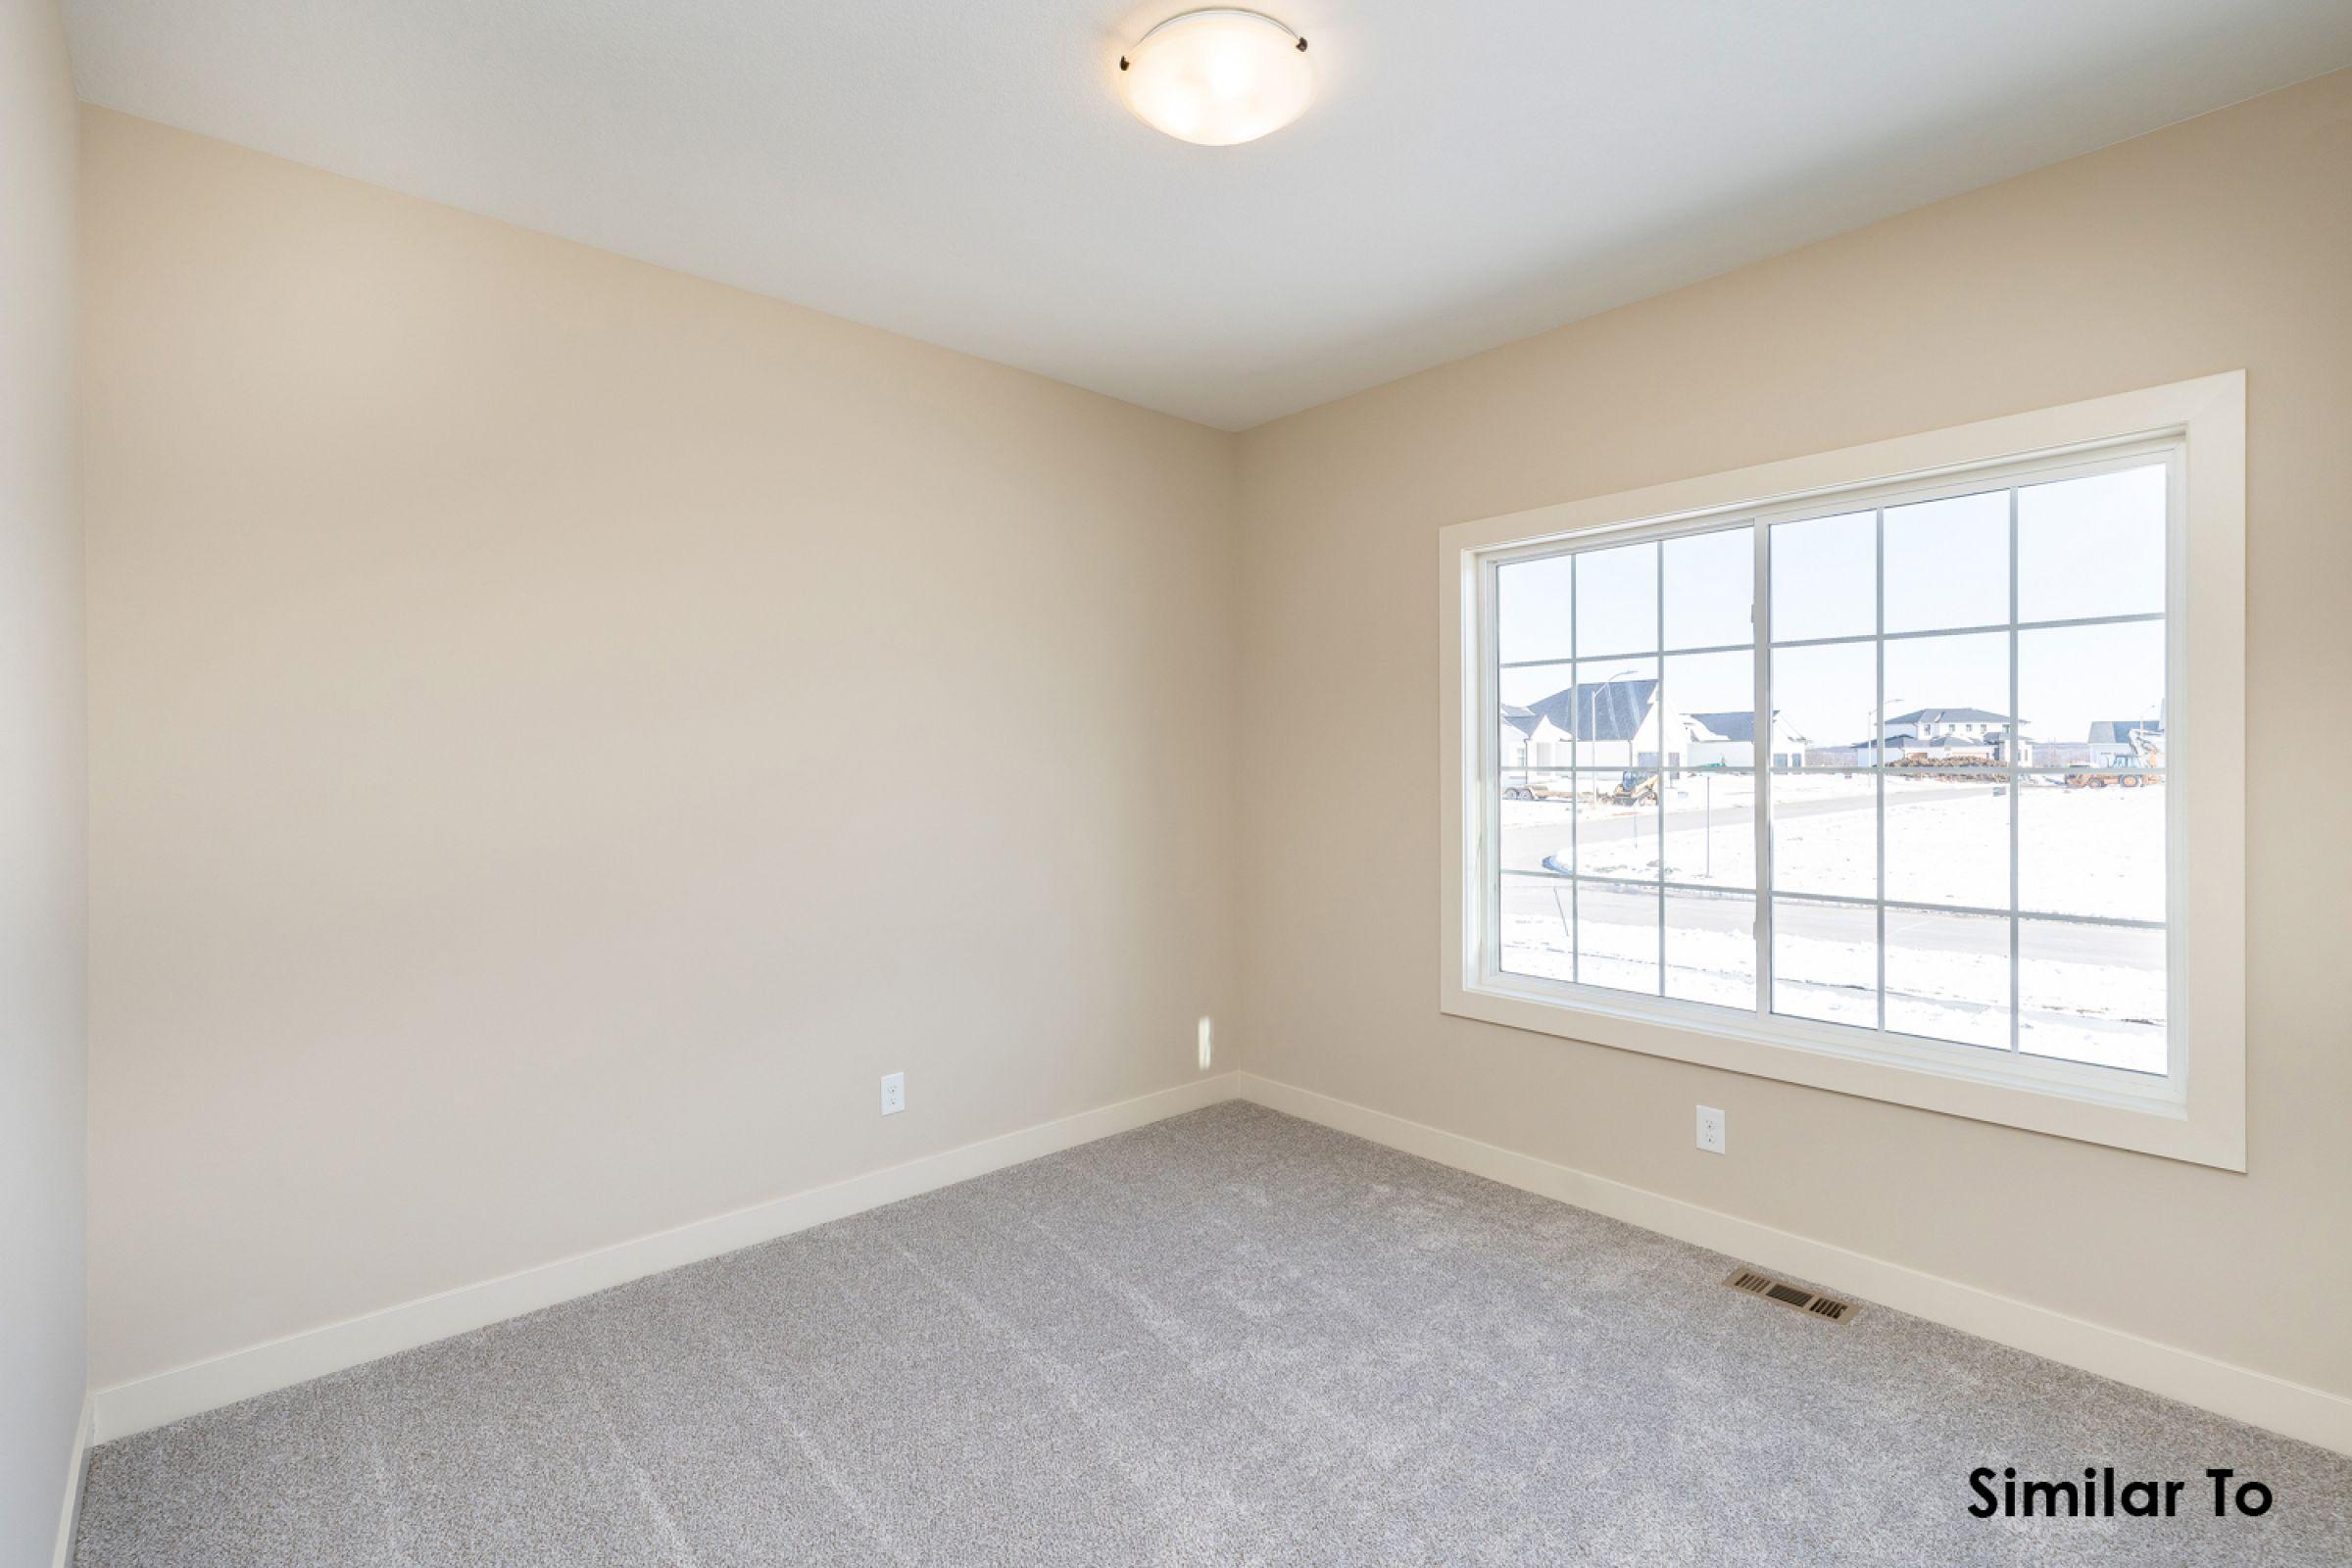 residential-warren-county-iowa-1-acres-listing-number-14995-17-2020-08-03-165355.jpg